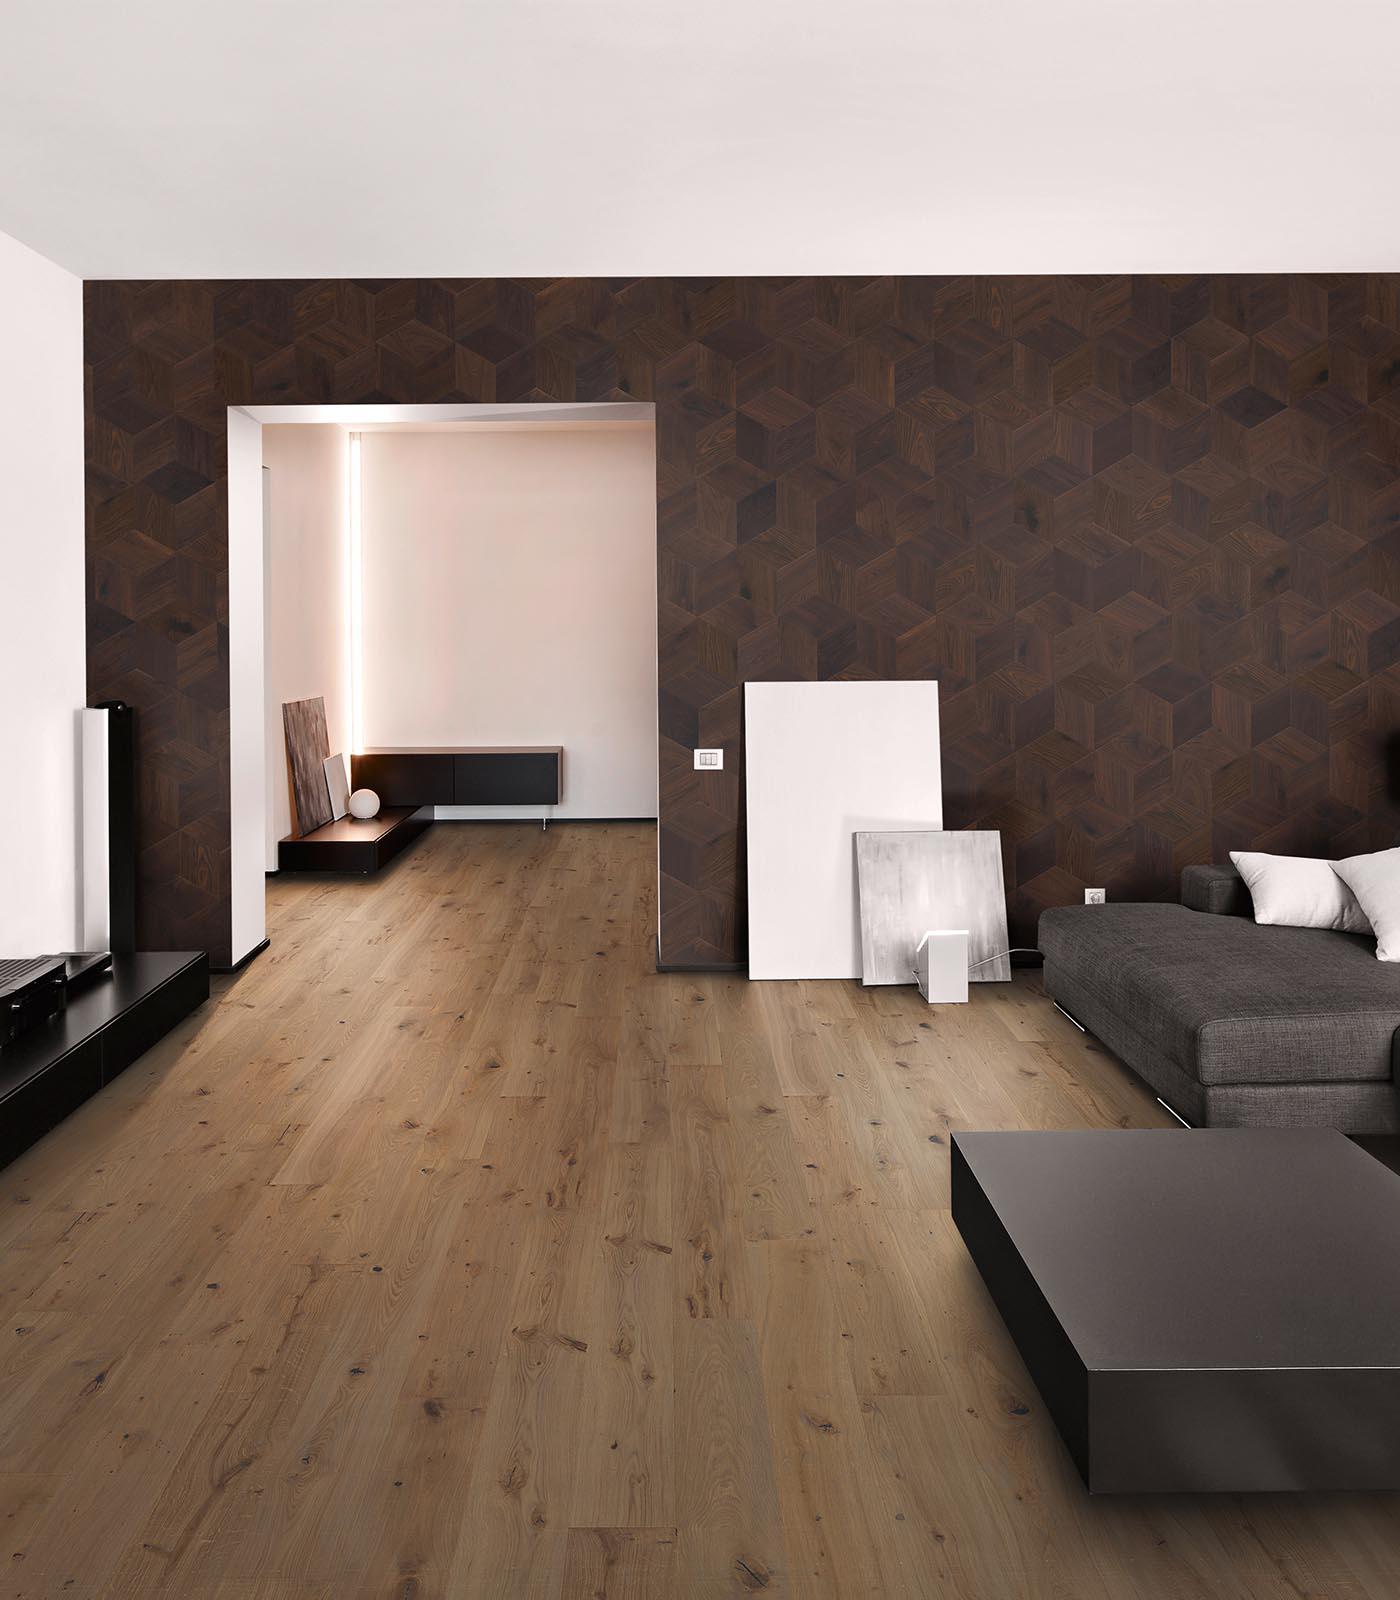 Kratos-Baroque Collection-European Oak wall panelling-room